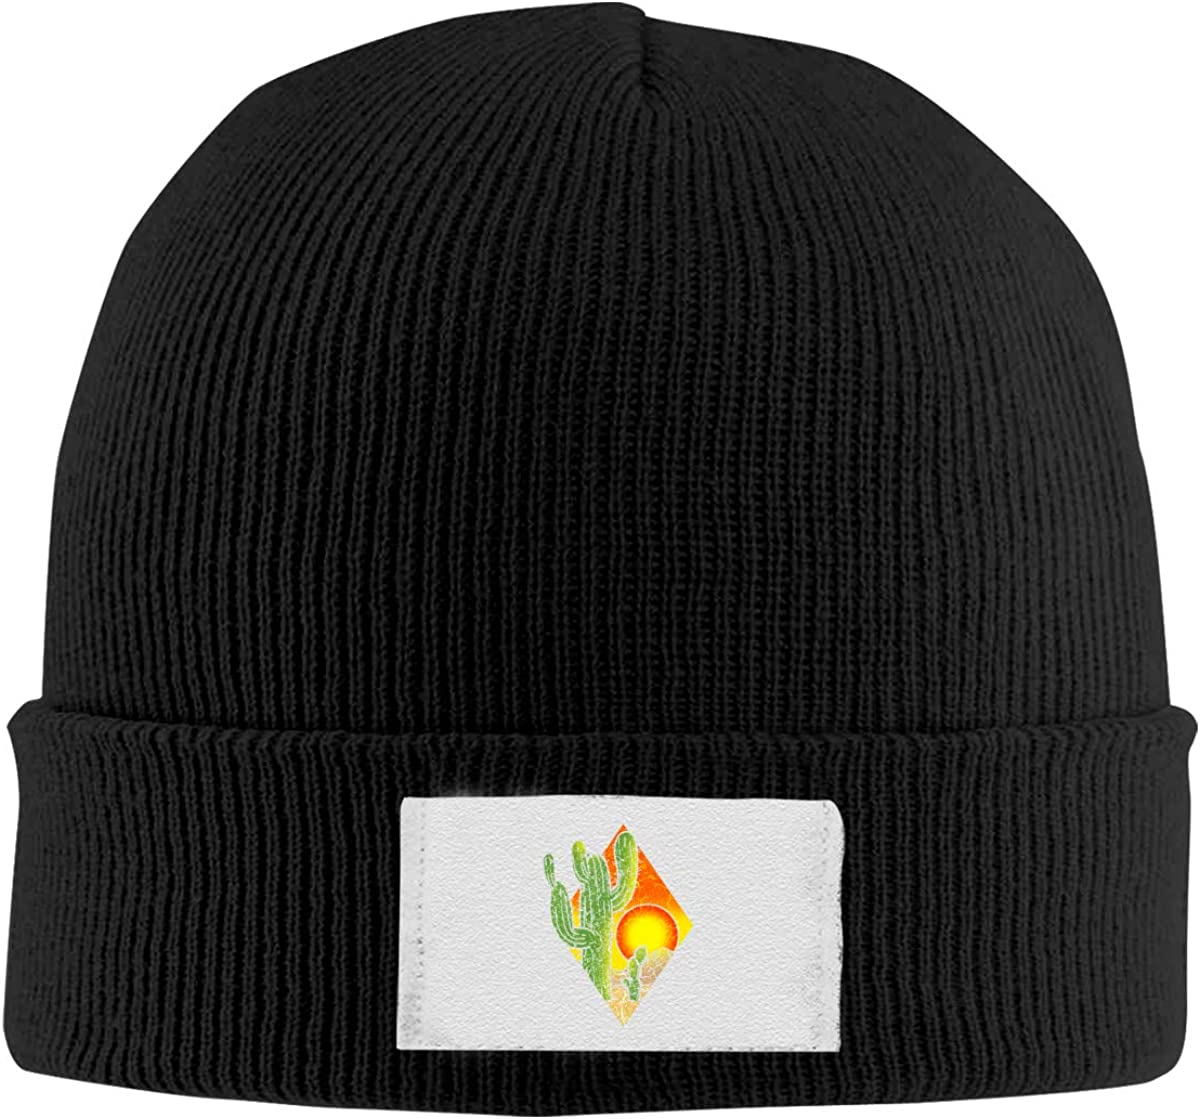 Desert Egypt Cactus Knit Hat Beanies Caps Warm Unisex Winter Black